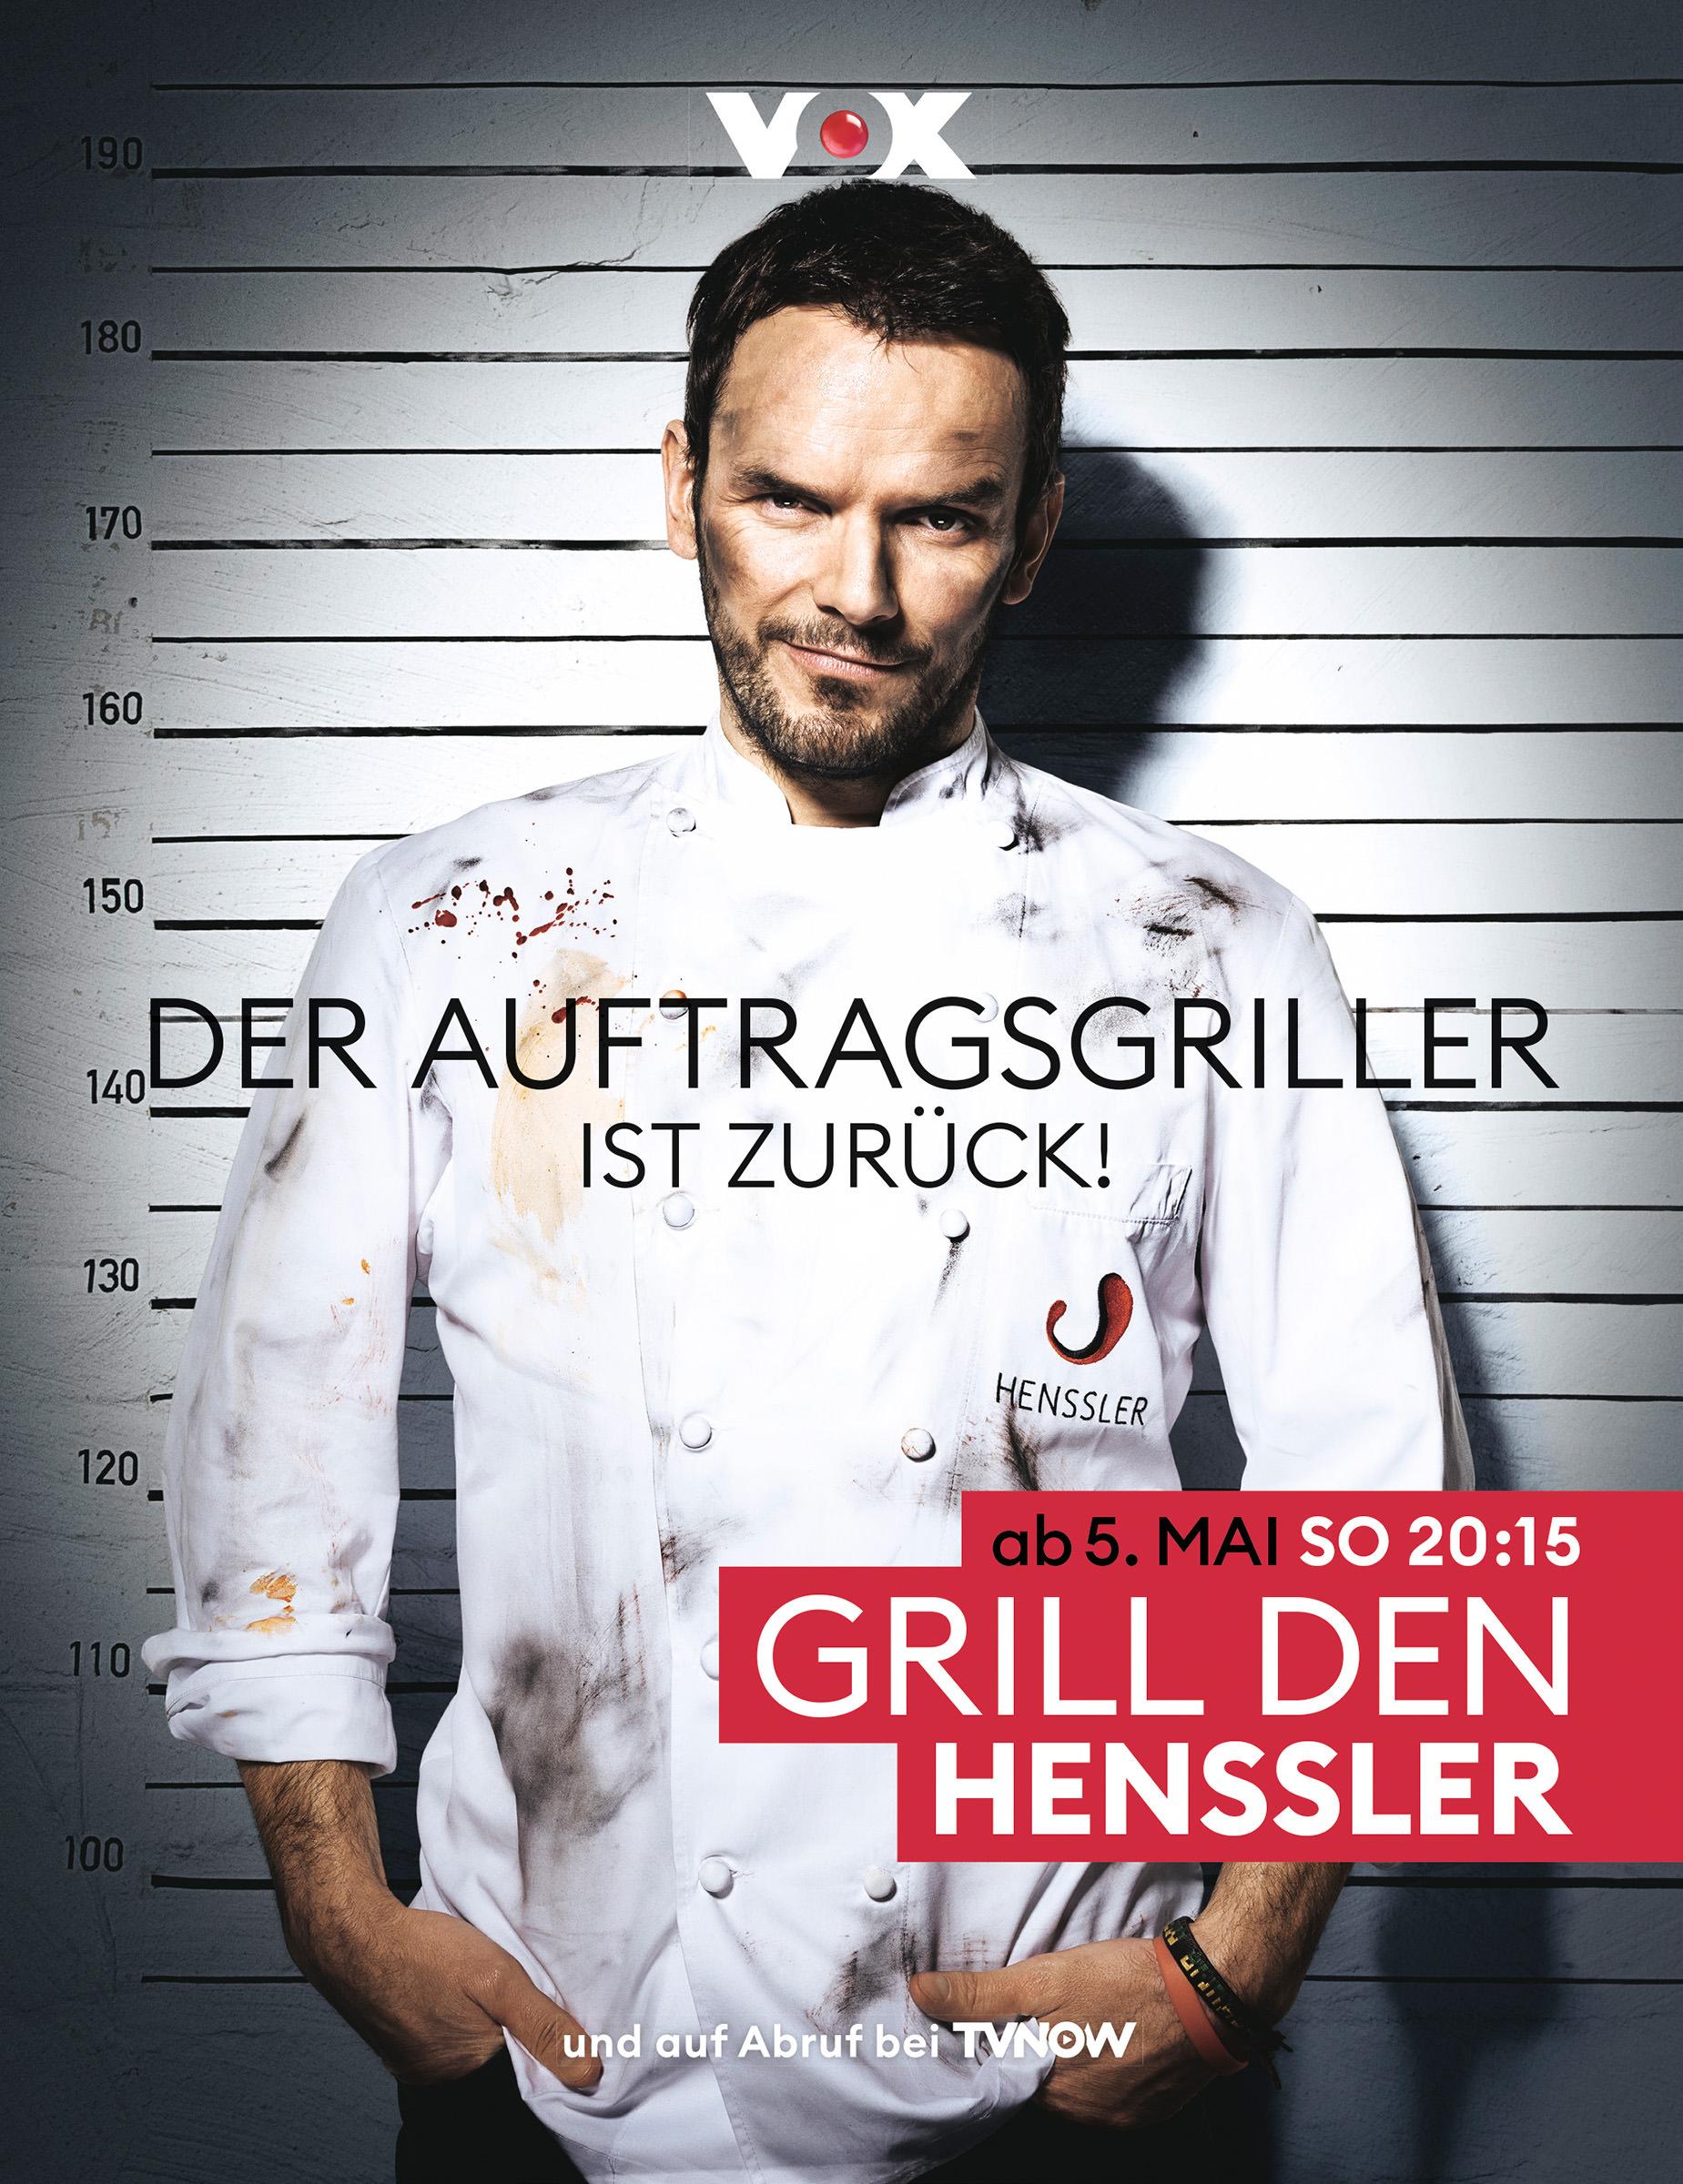 Steffen Henssler // Grill den Henssler